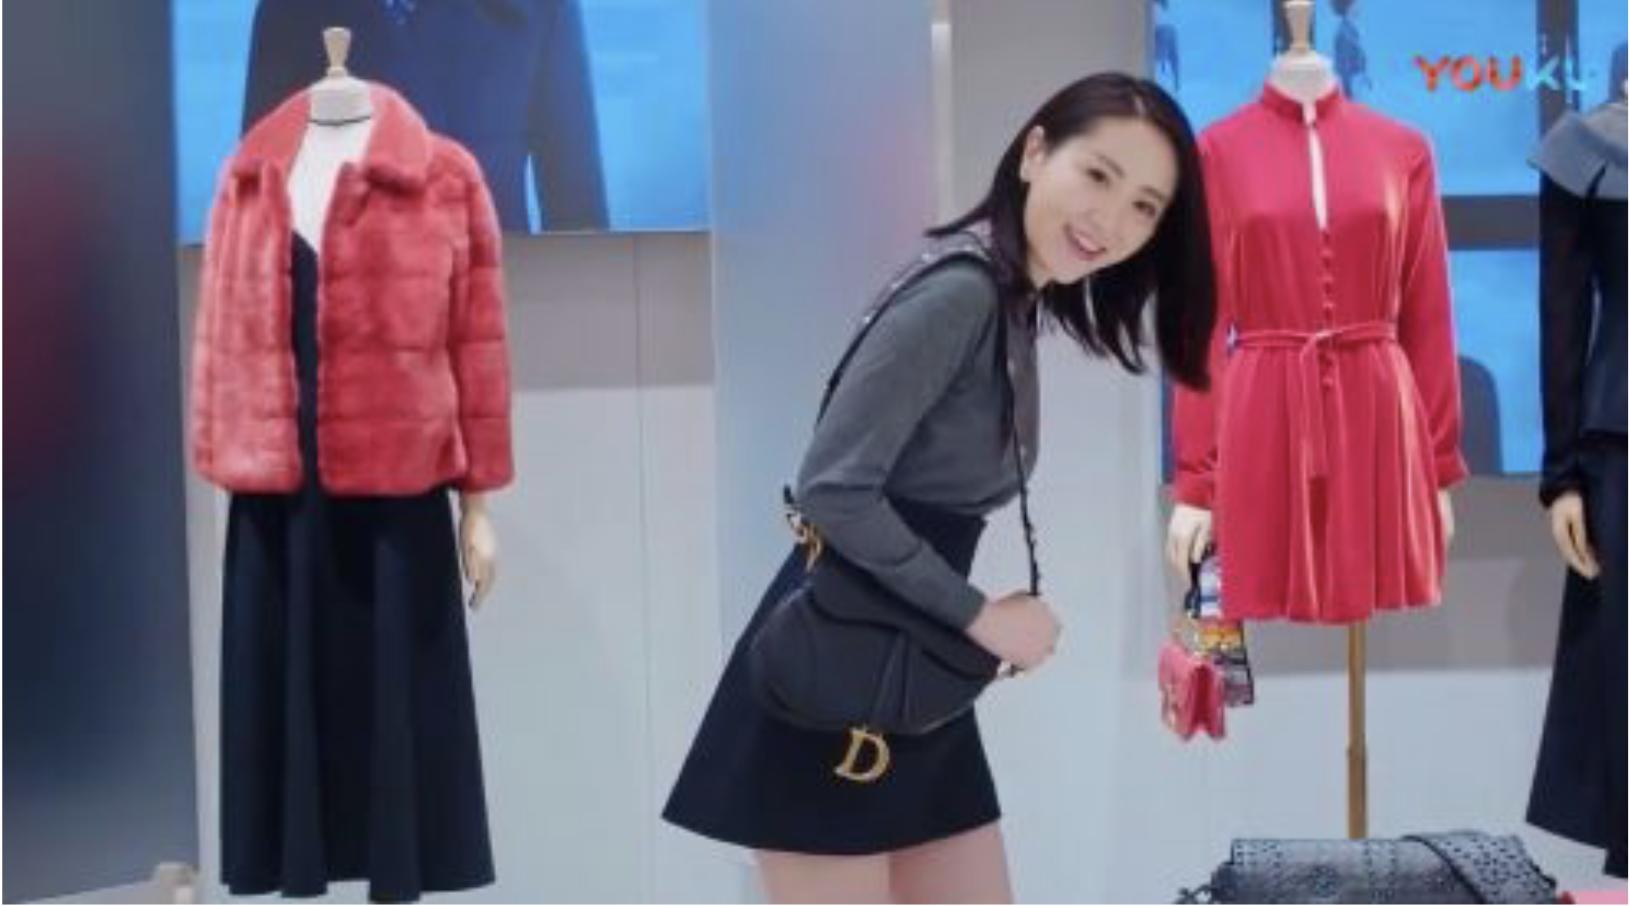 elle女包_Dior马鞍包广告遭受群嘲,年轻化战略为何越走越偏 | 第一财经杂志